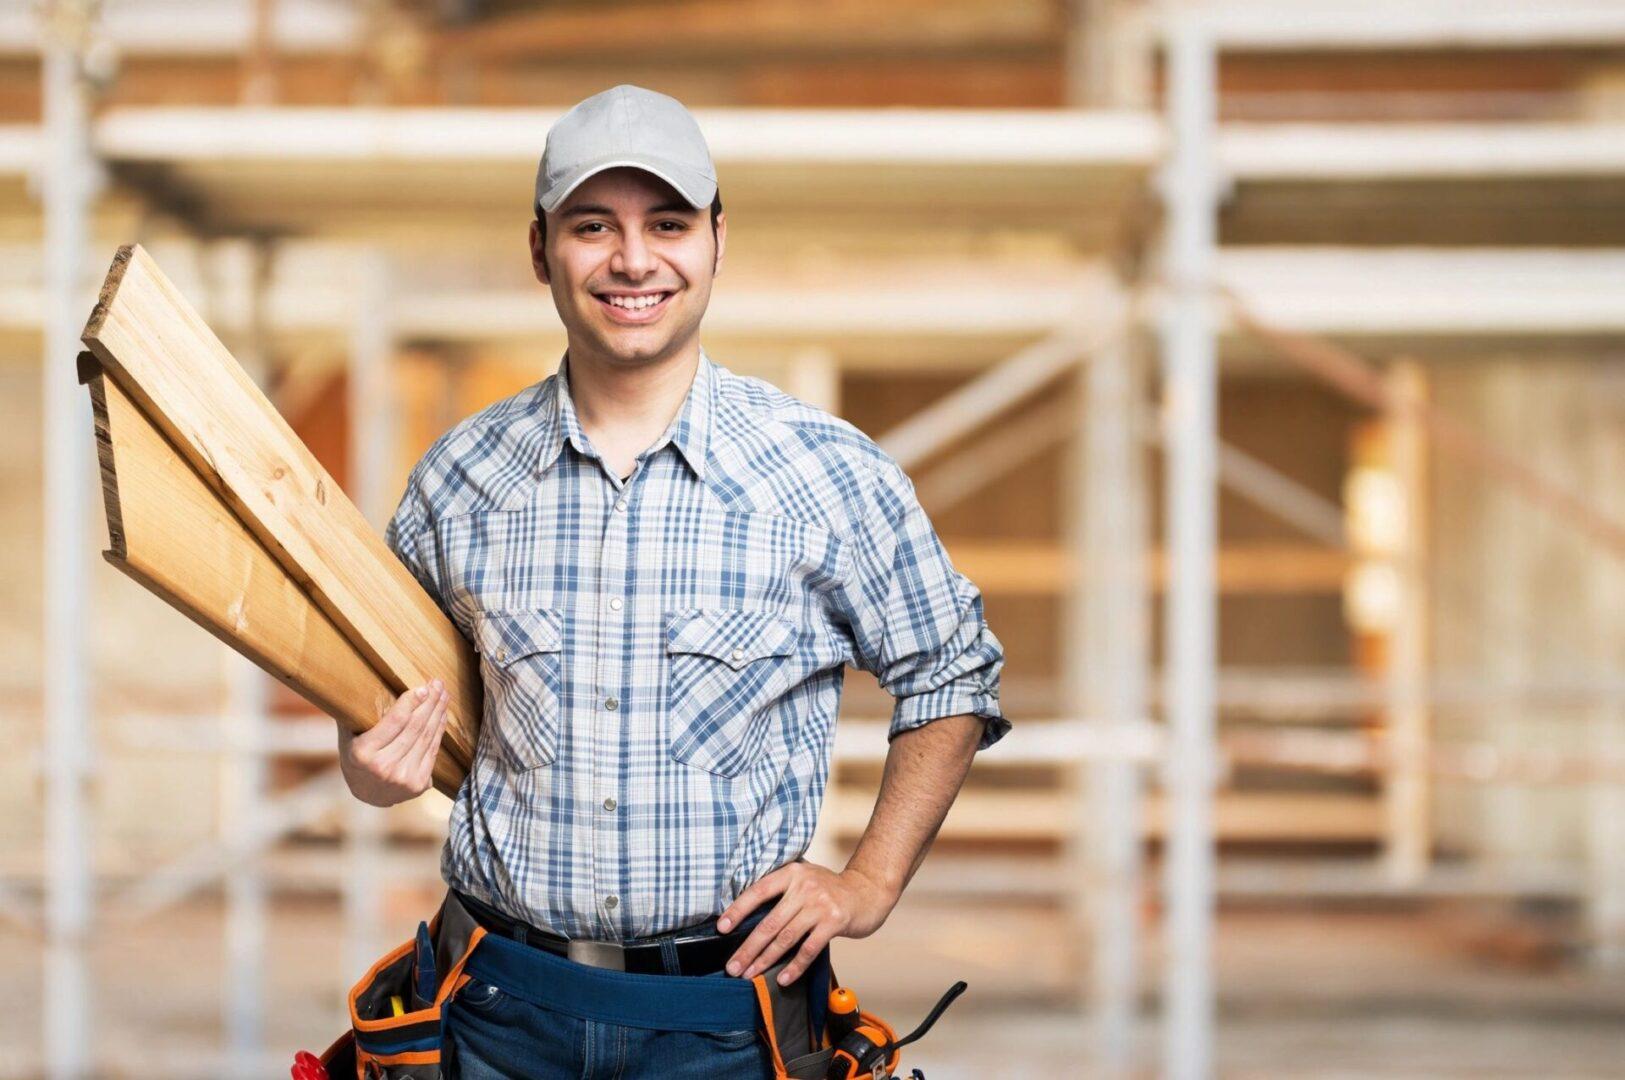 The Carpenter Edmonton Ltd